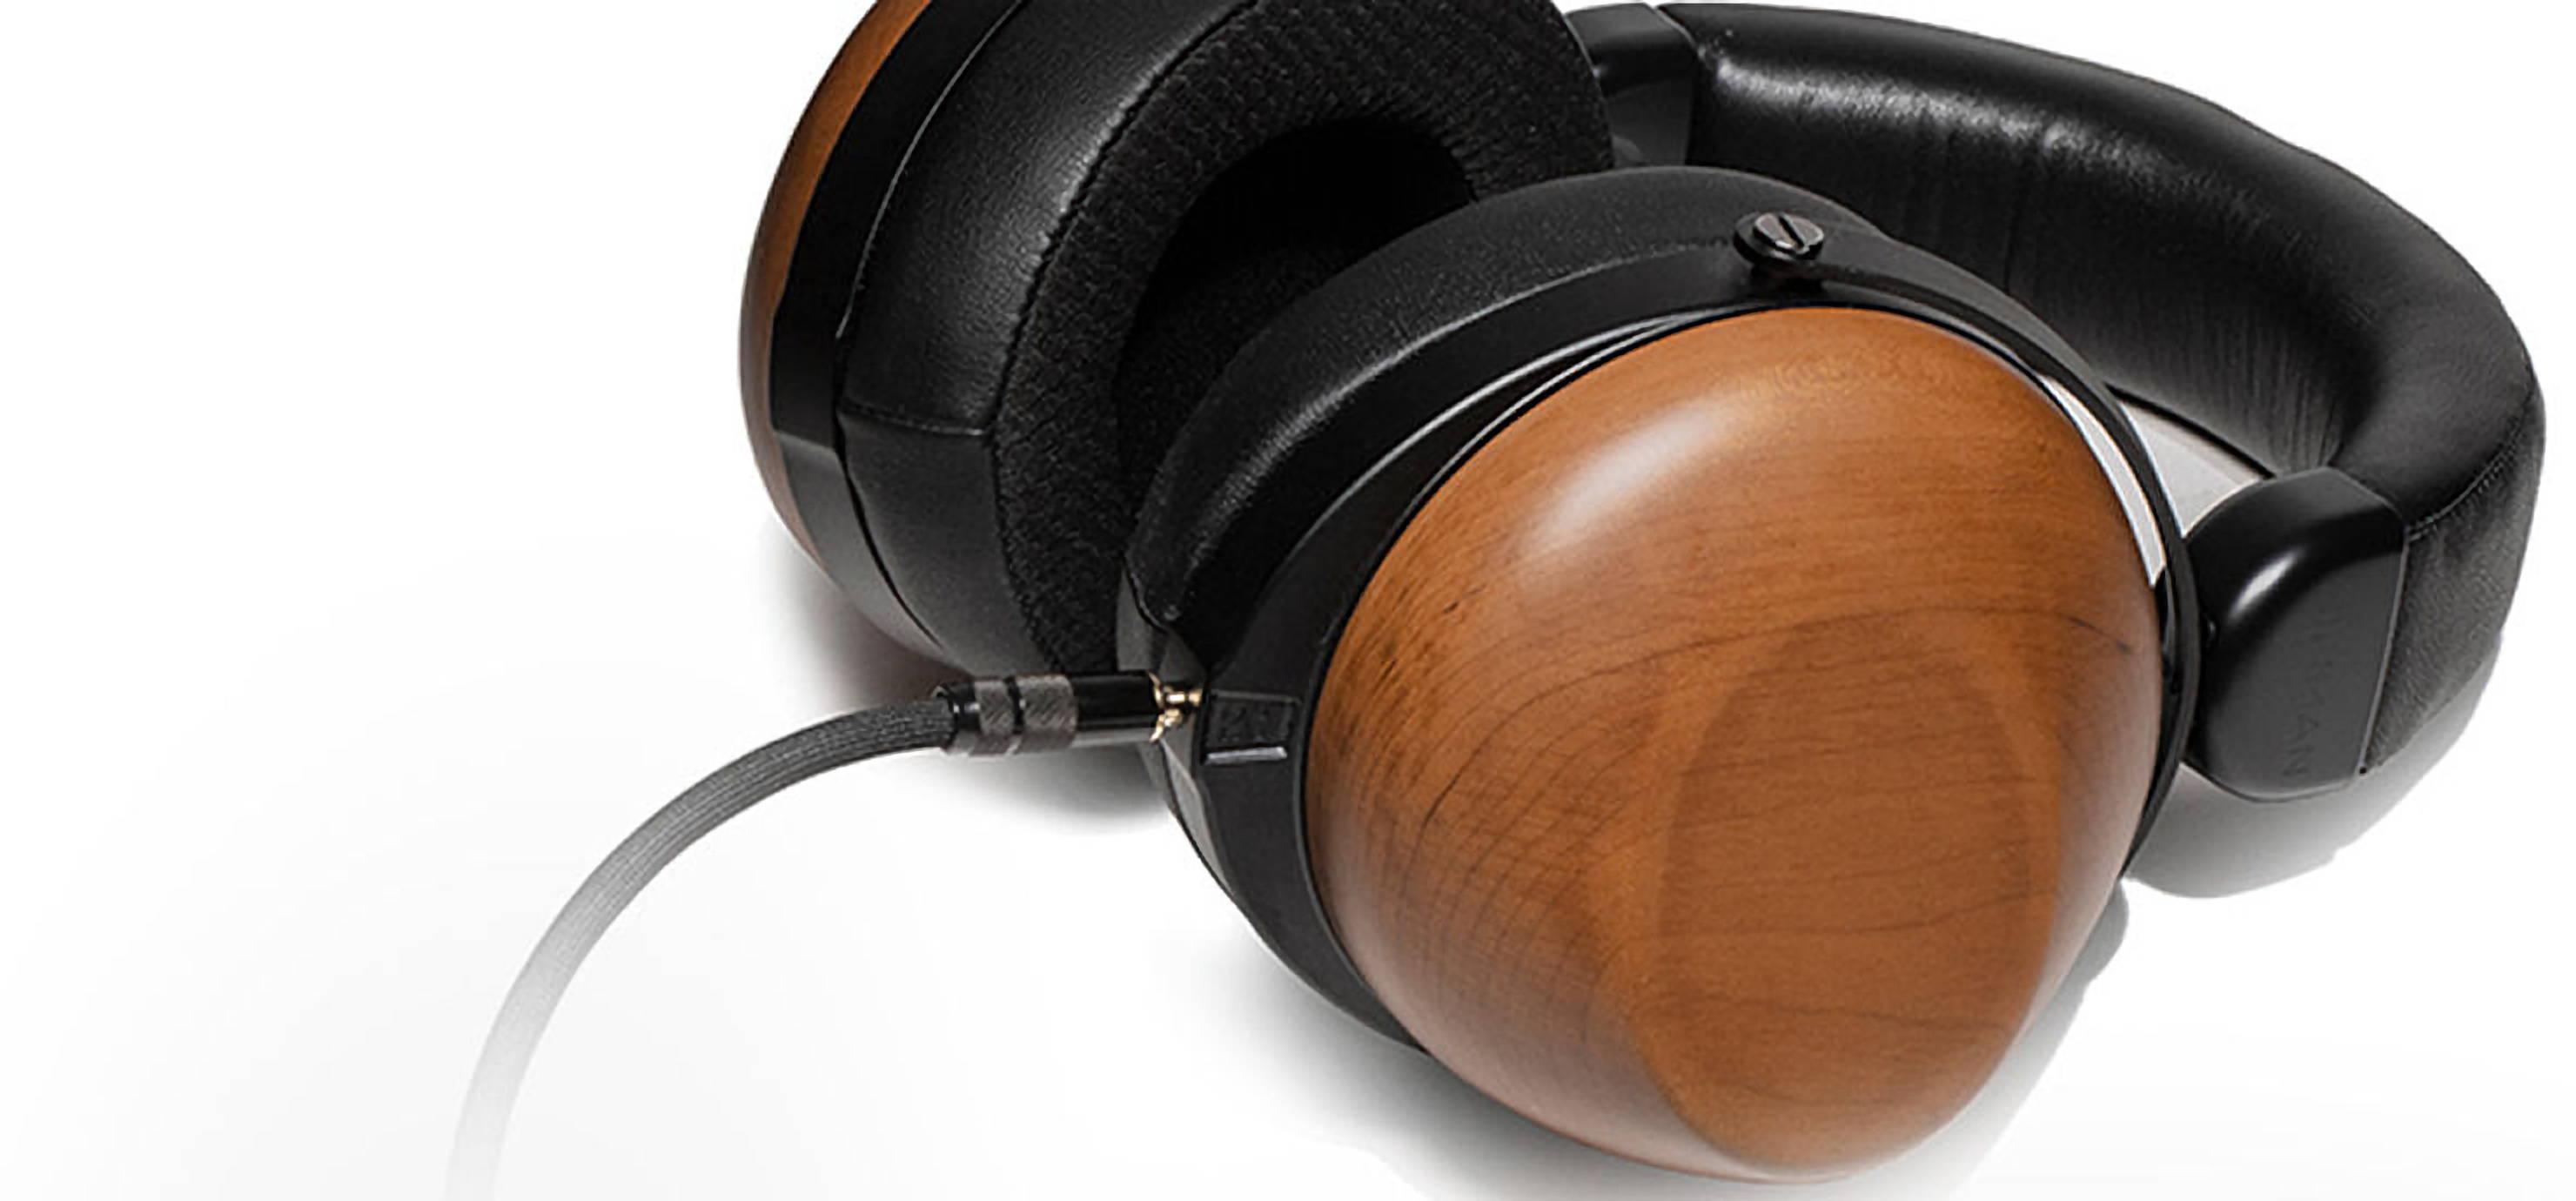 HIFIMAN HE-R10P Headphone